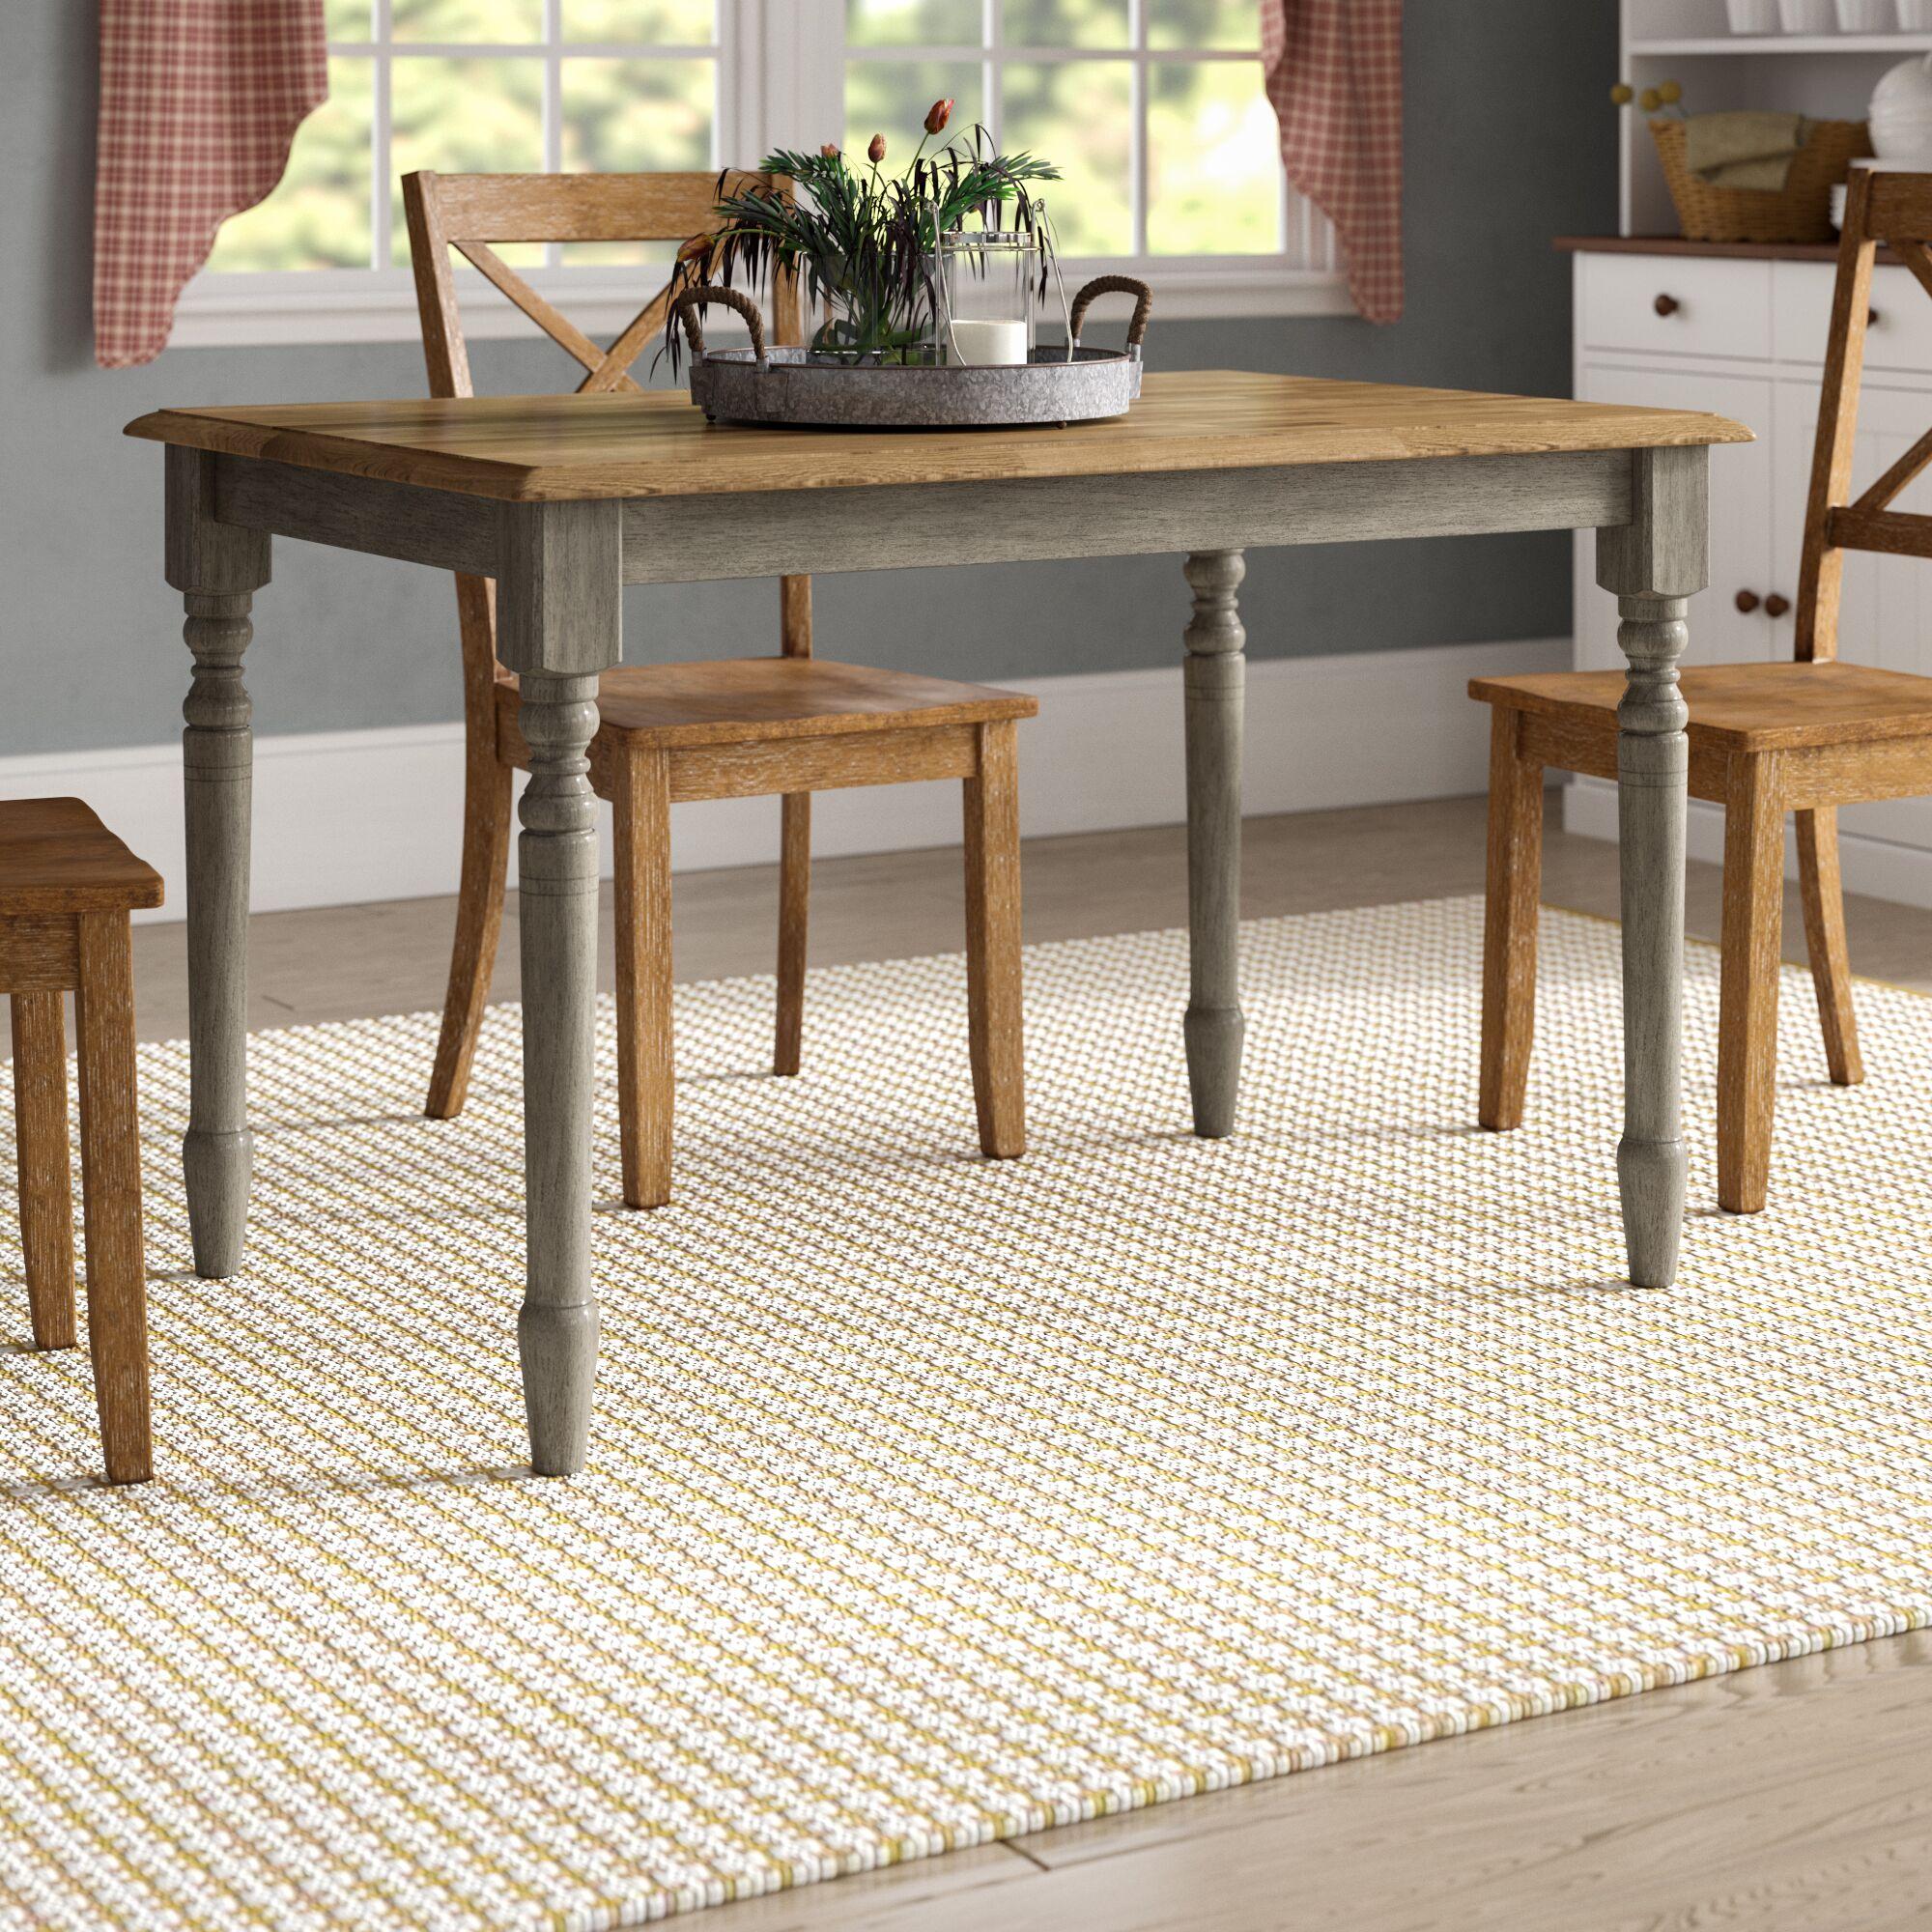 Sima Leg Dining Table Color: Gray